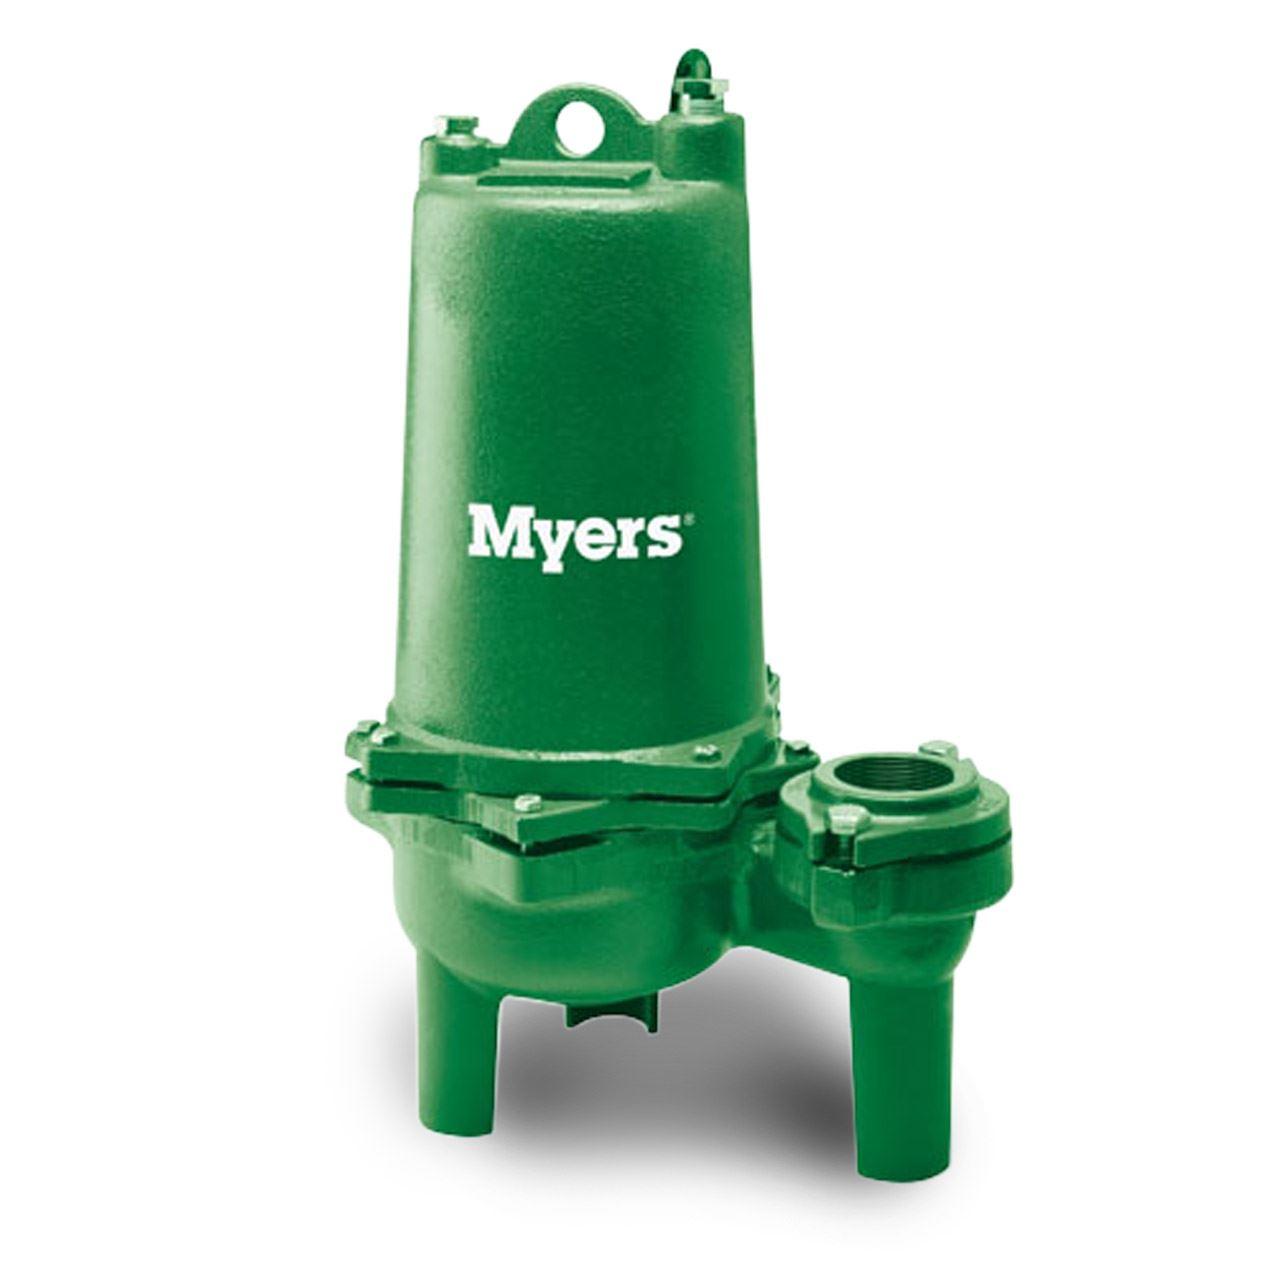 Myers Grinder Pump Wiring Diagram Diagrams Whr15h 21 High Head Sewage 1 5 Hp 230v Ph Repair